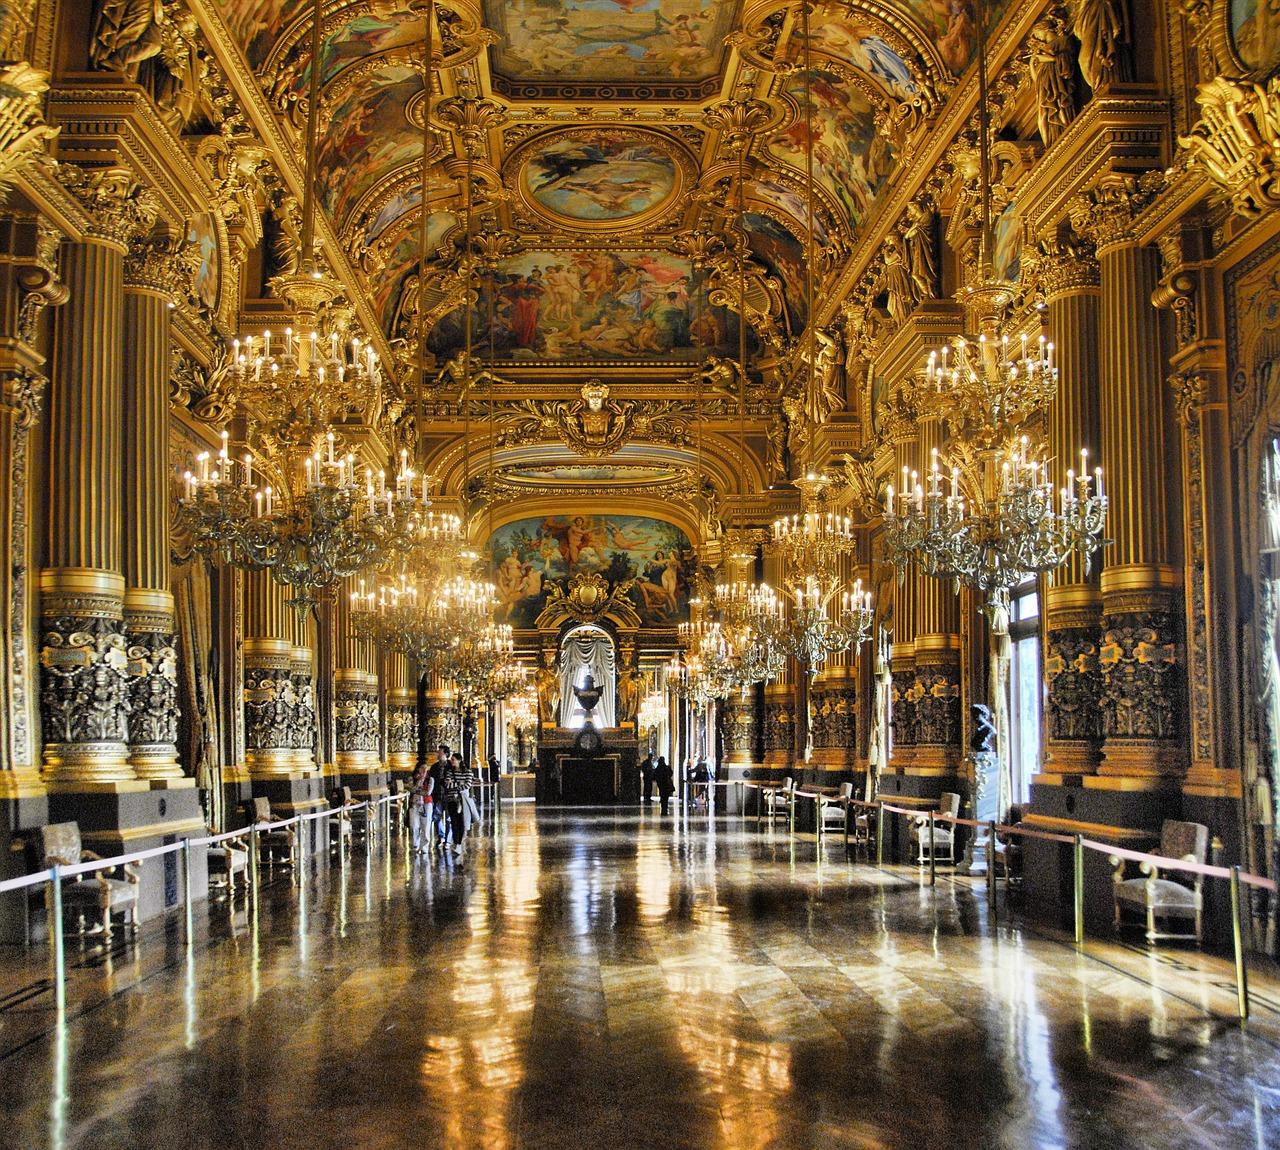 Interior of the Opera Garnier palace